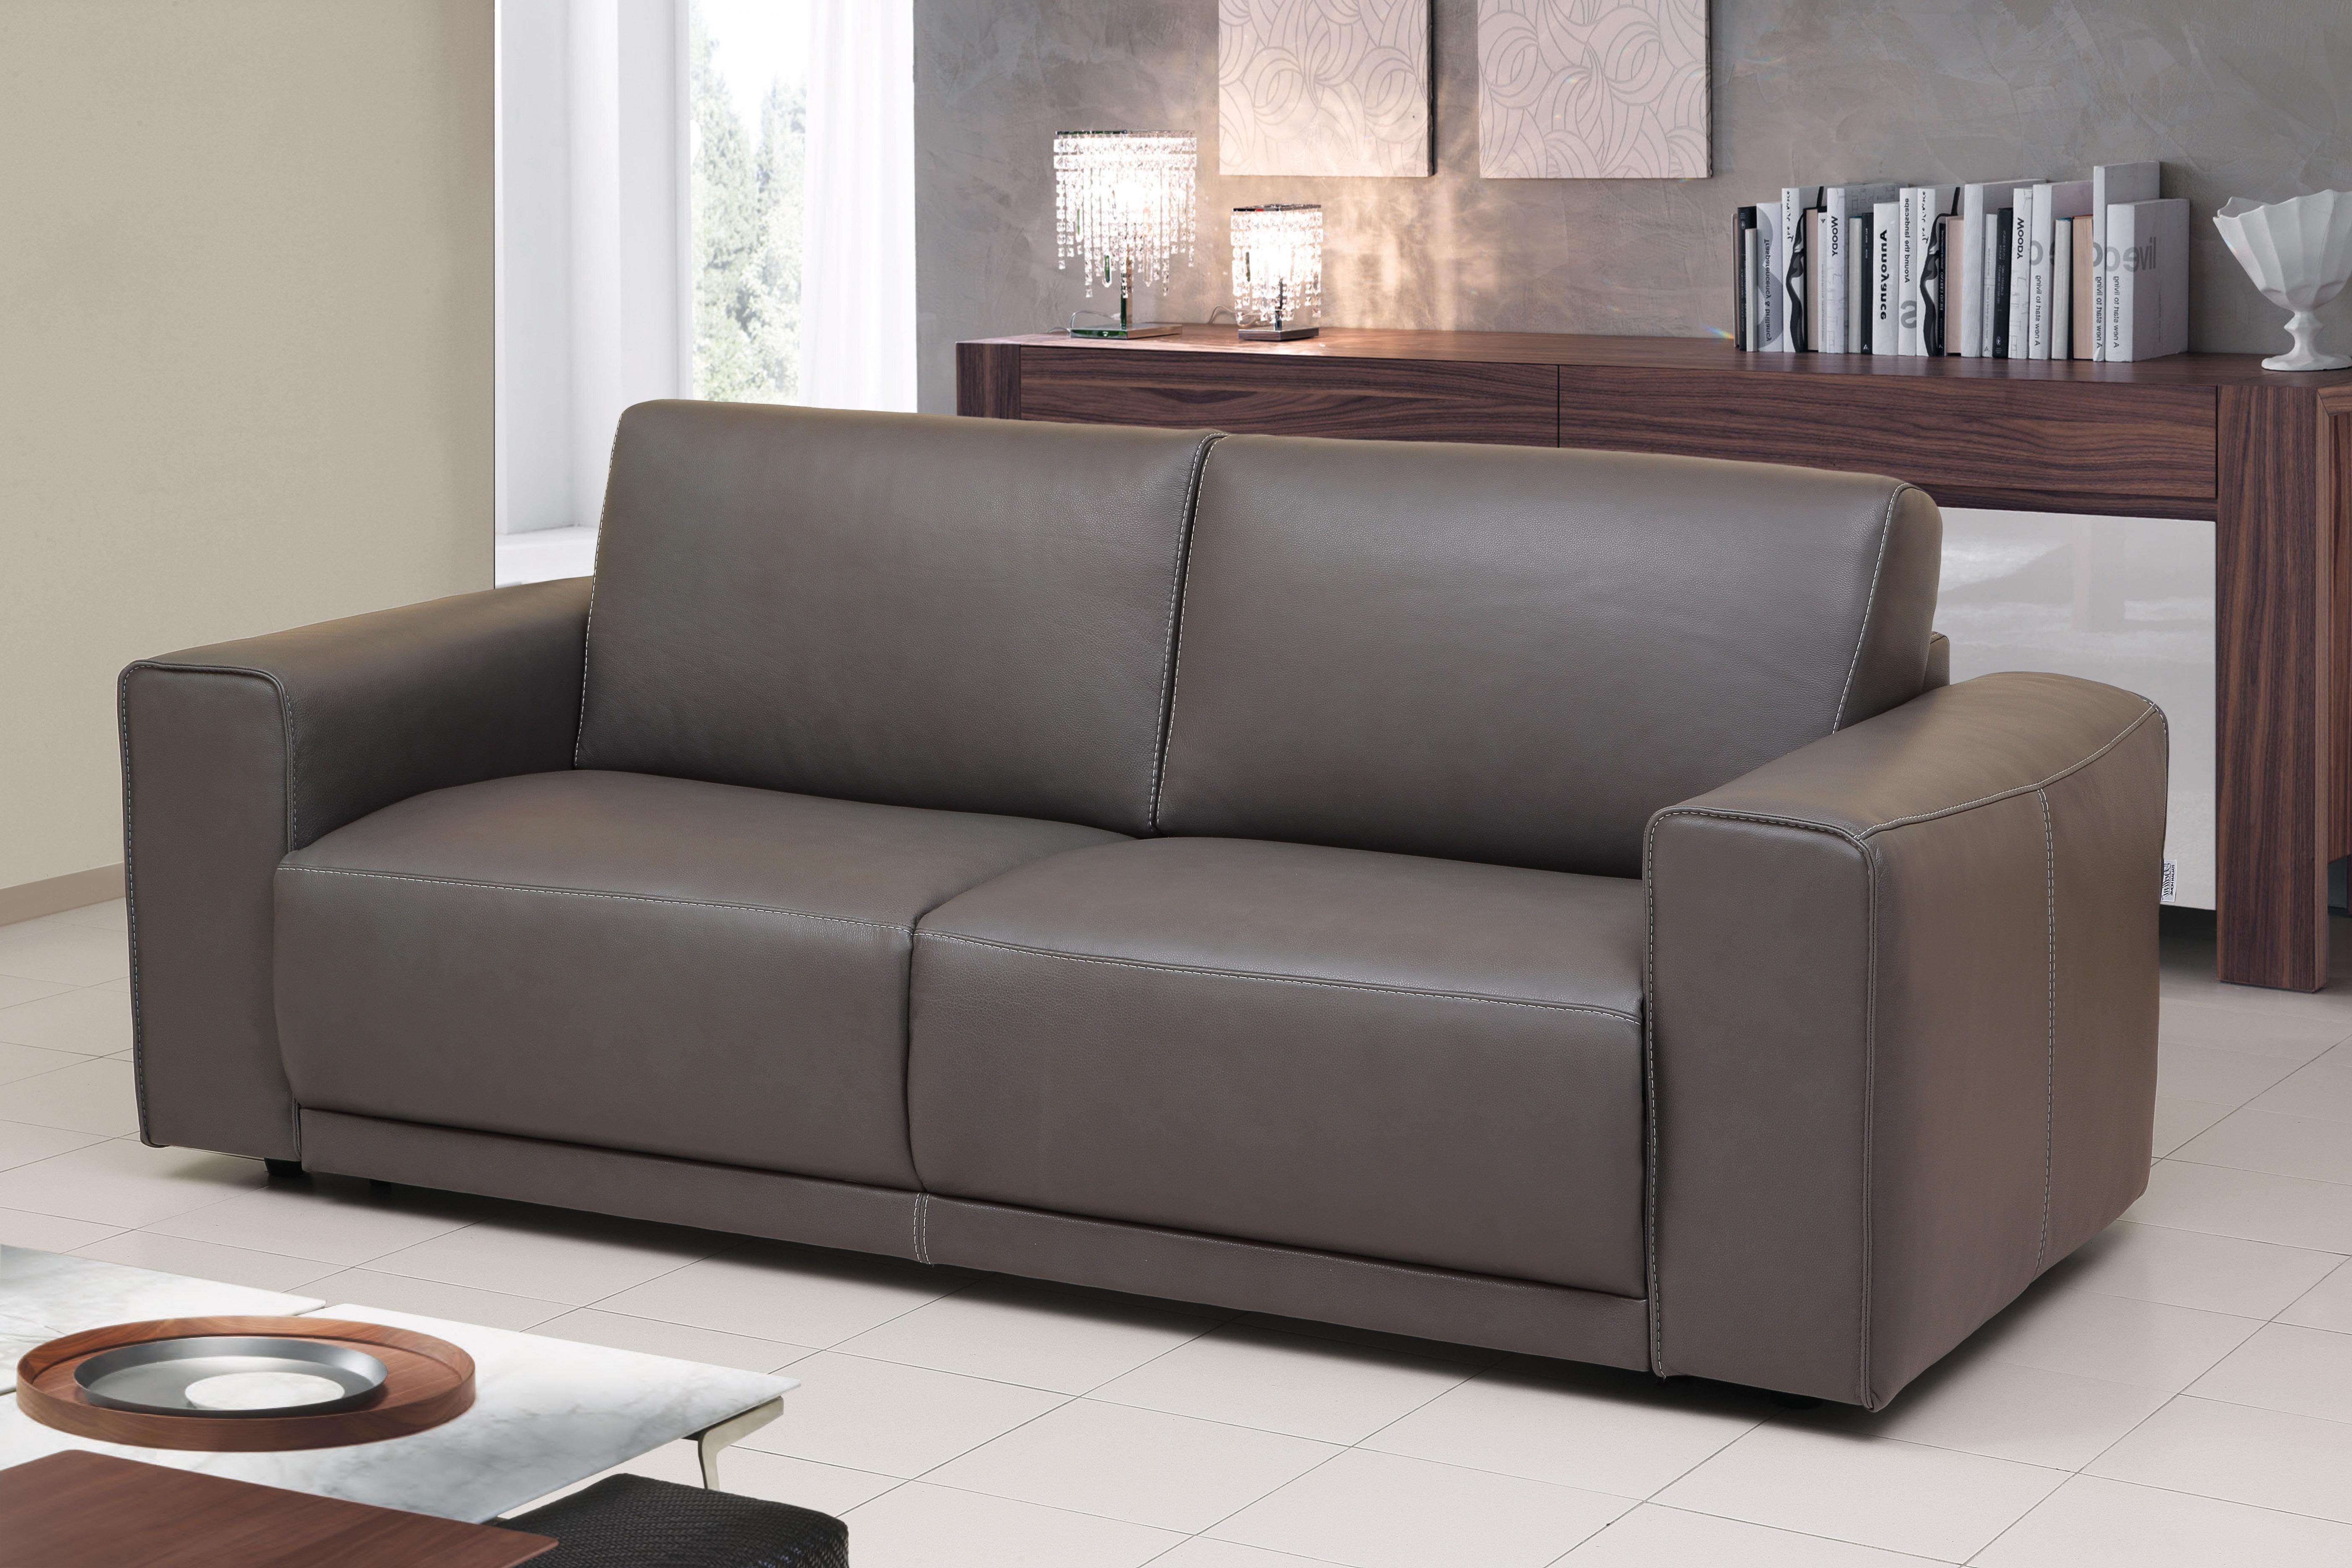 Etonnant Rowley Genuine Leather Sofa Bed Sleeper